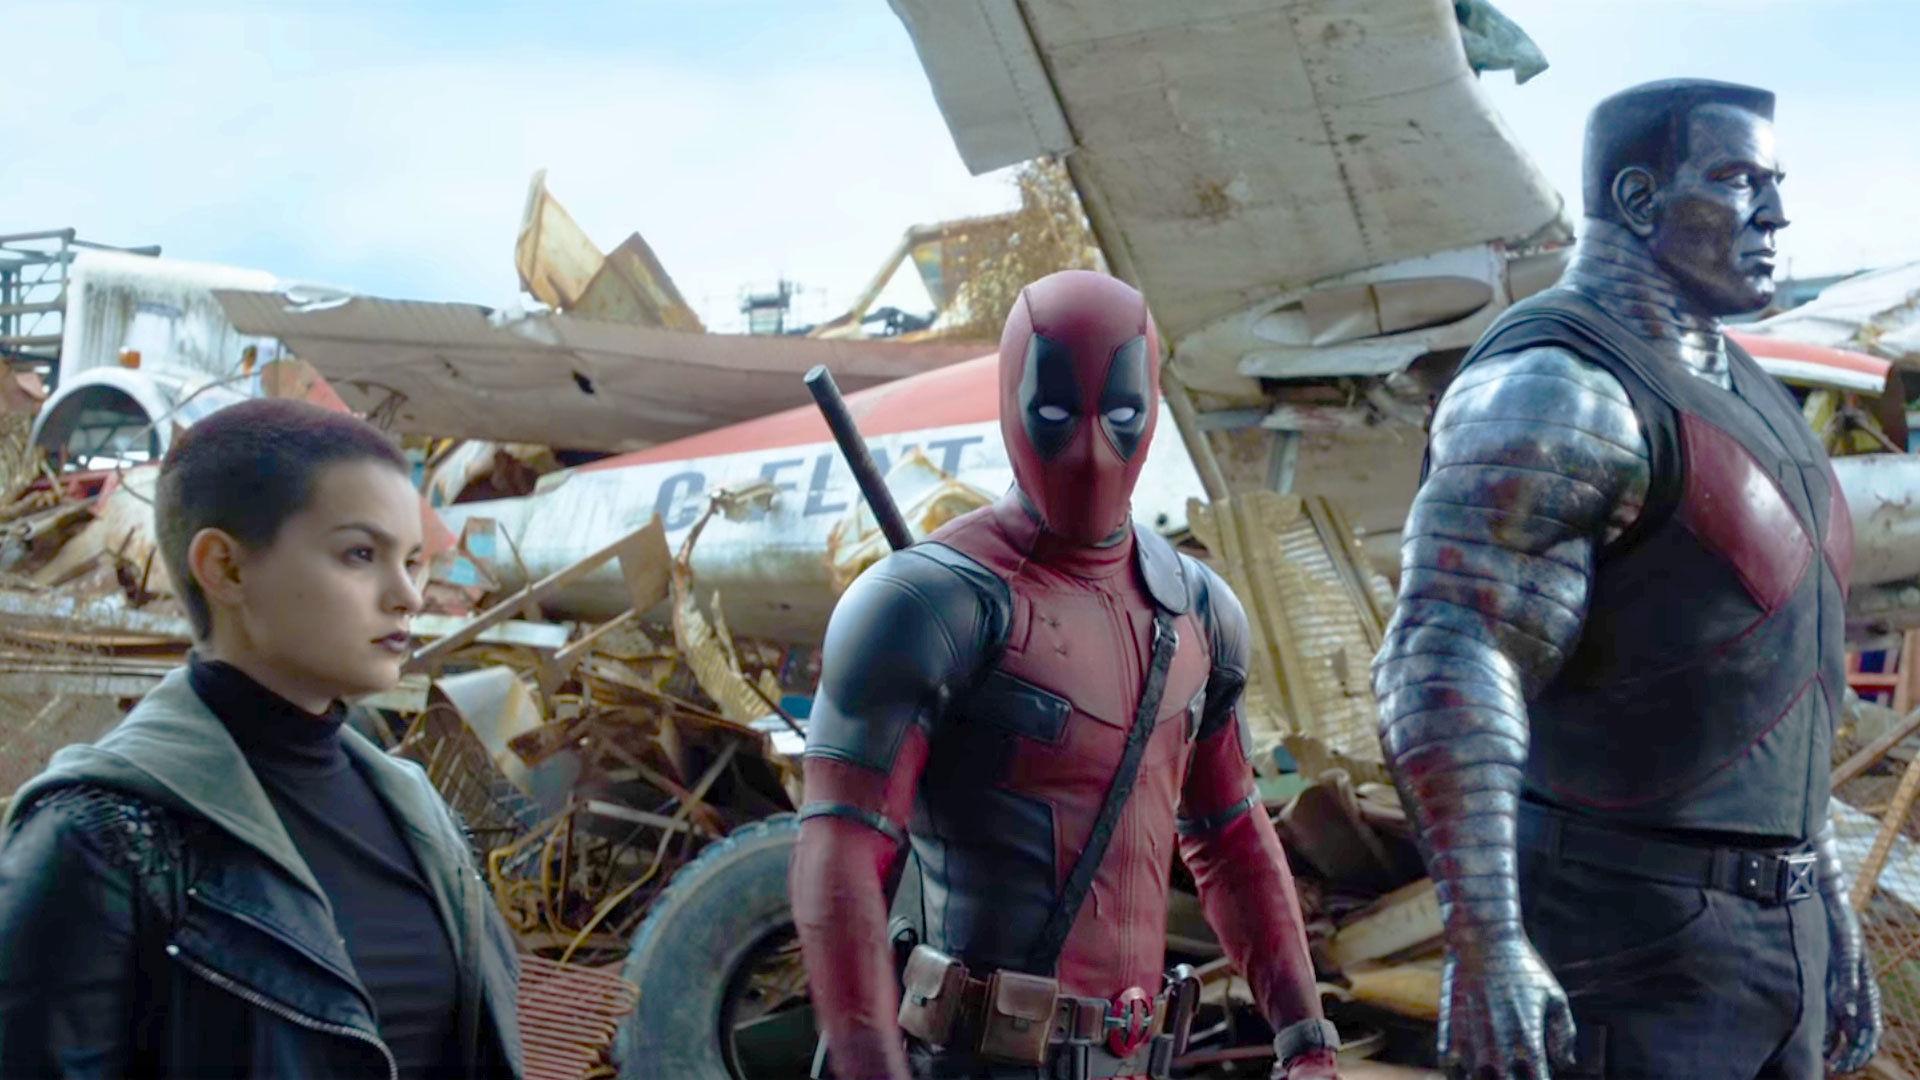 Negasonic Teenage Warhead, Deadpool and Colossus - Source: Entertainment Weekly/FOX